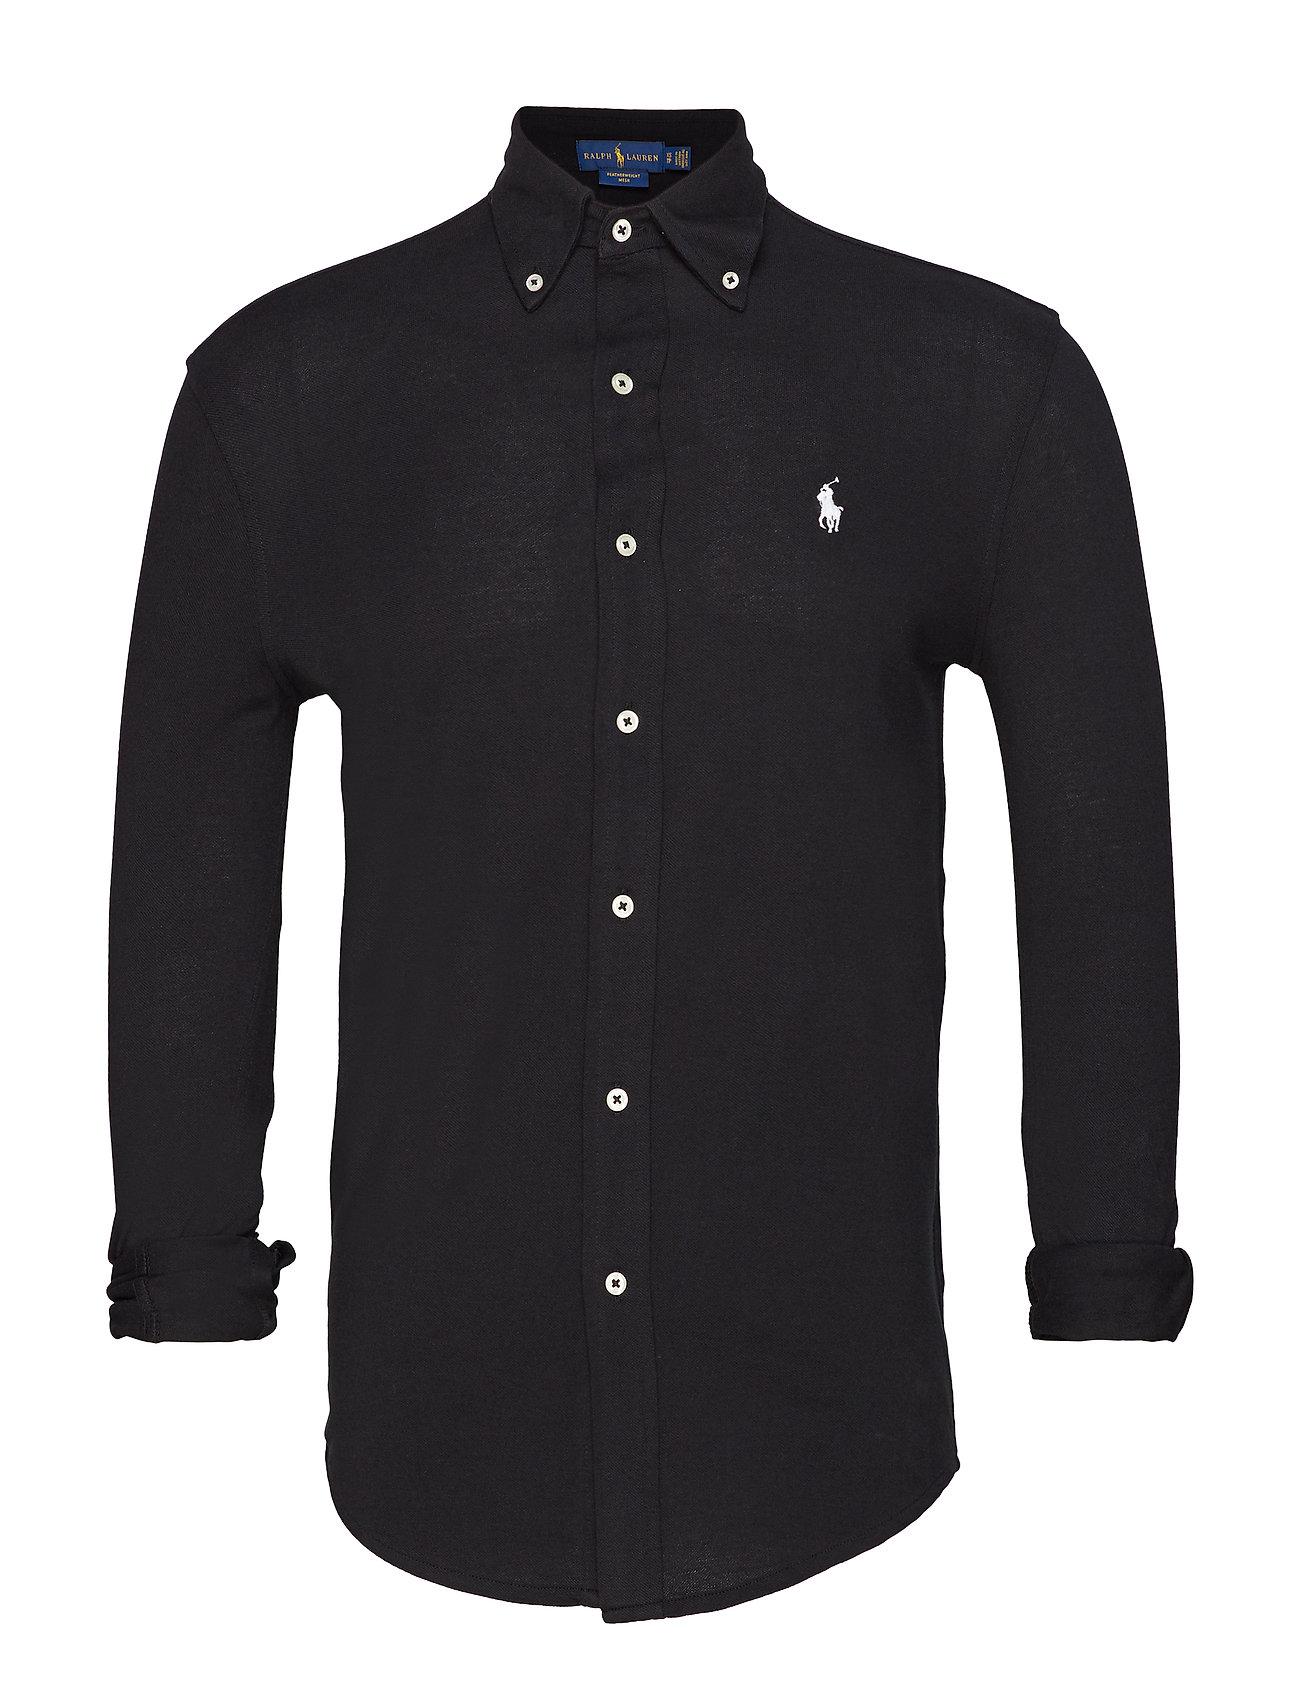 Polo Ralph Lauren Featherweight Mesh Shirt - POLO BLACK